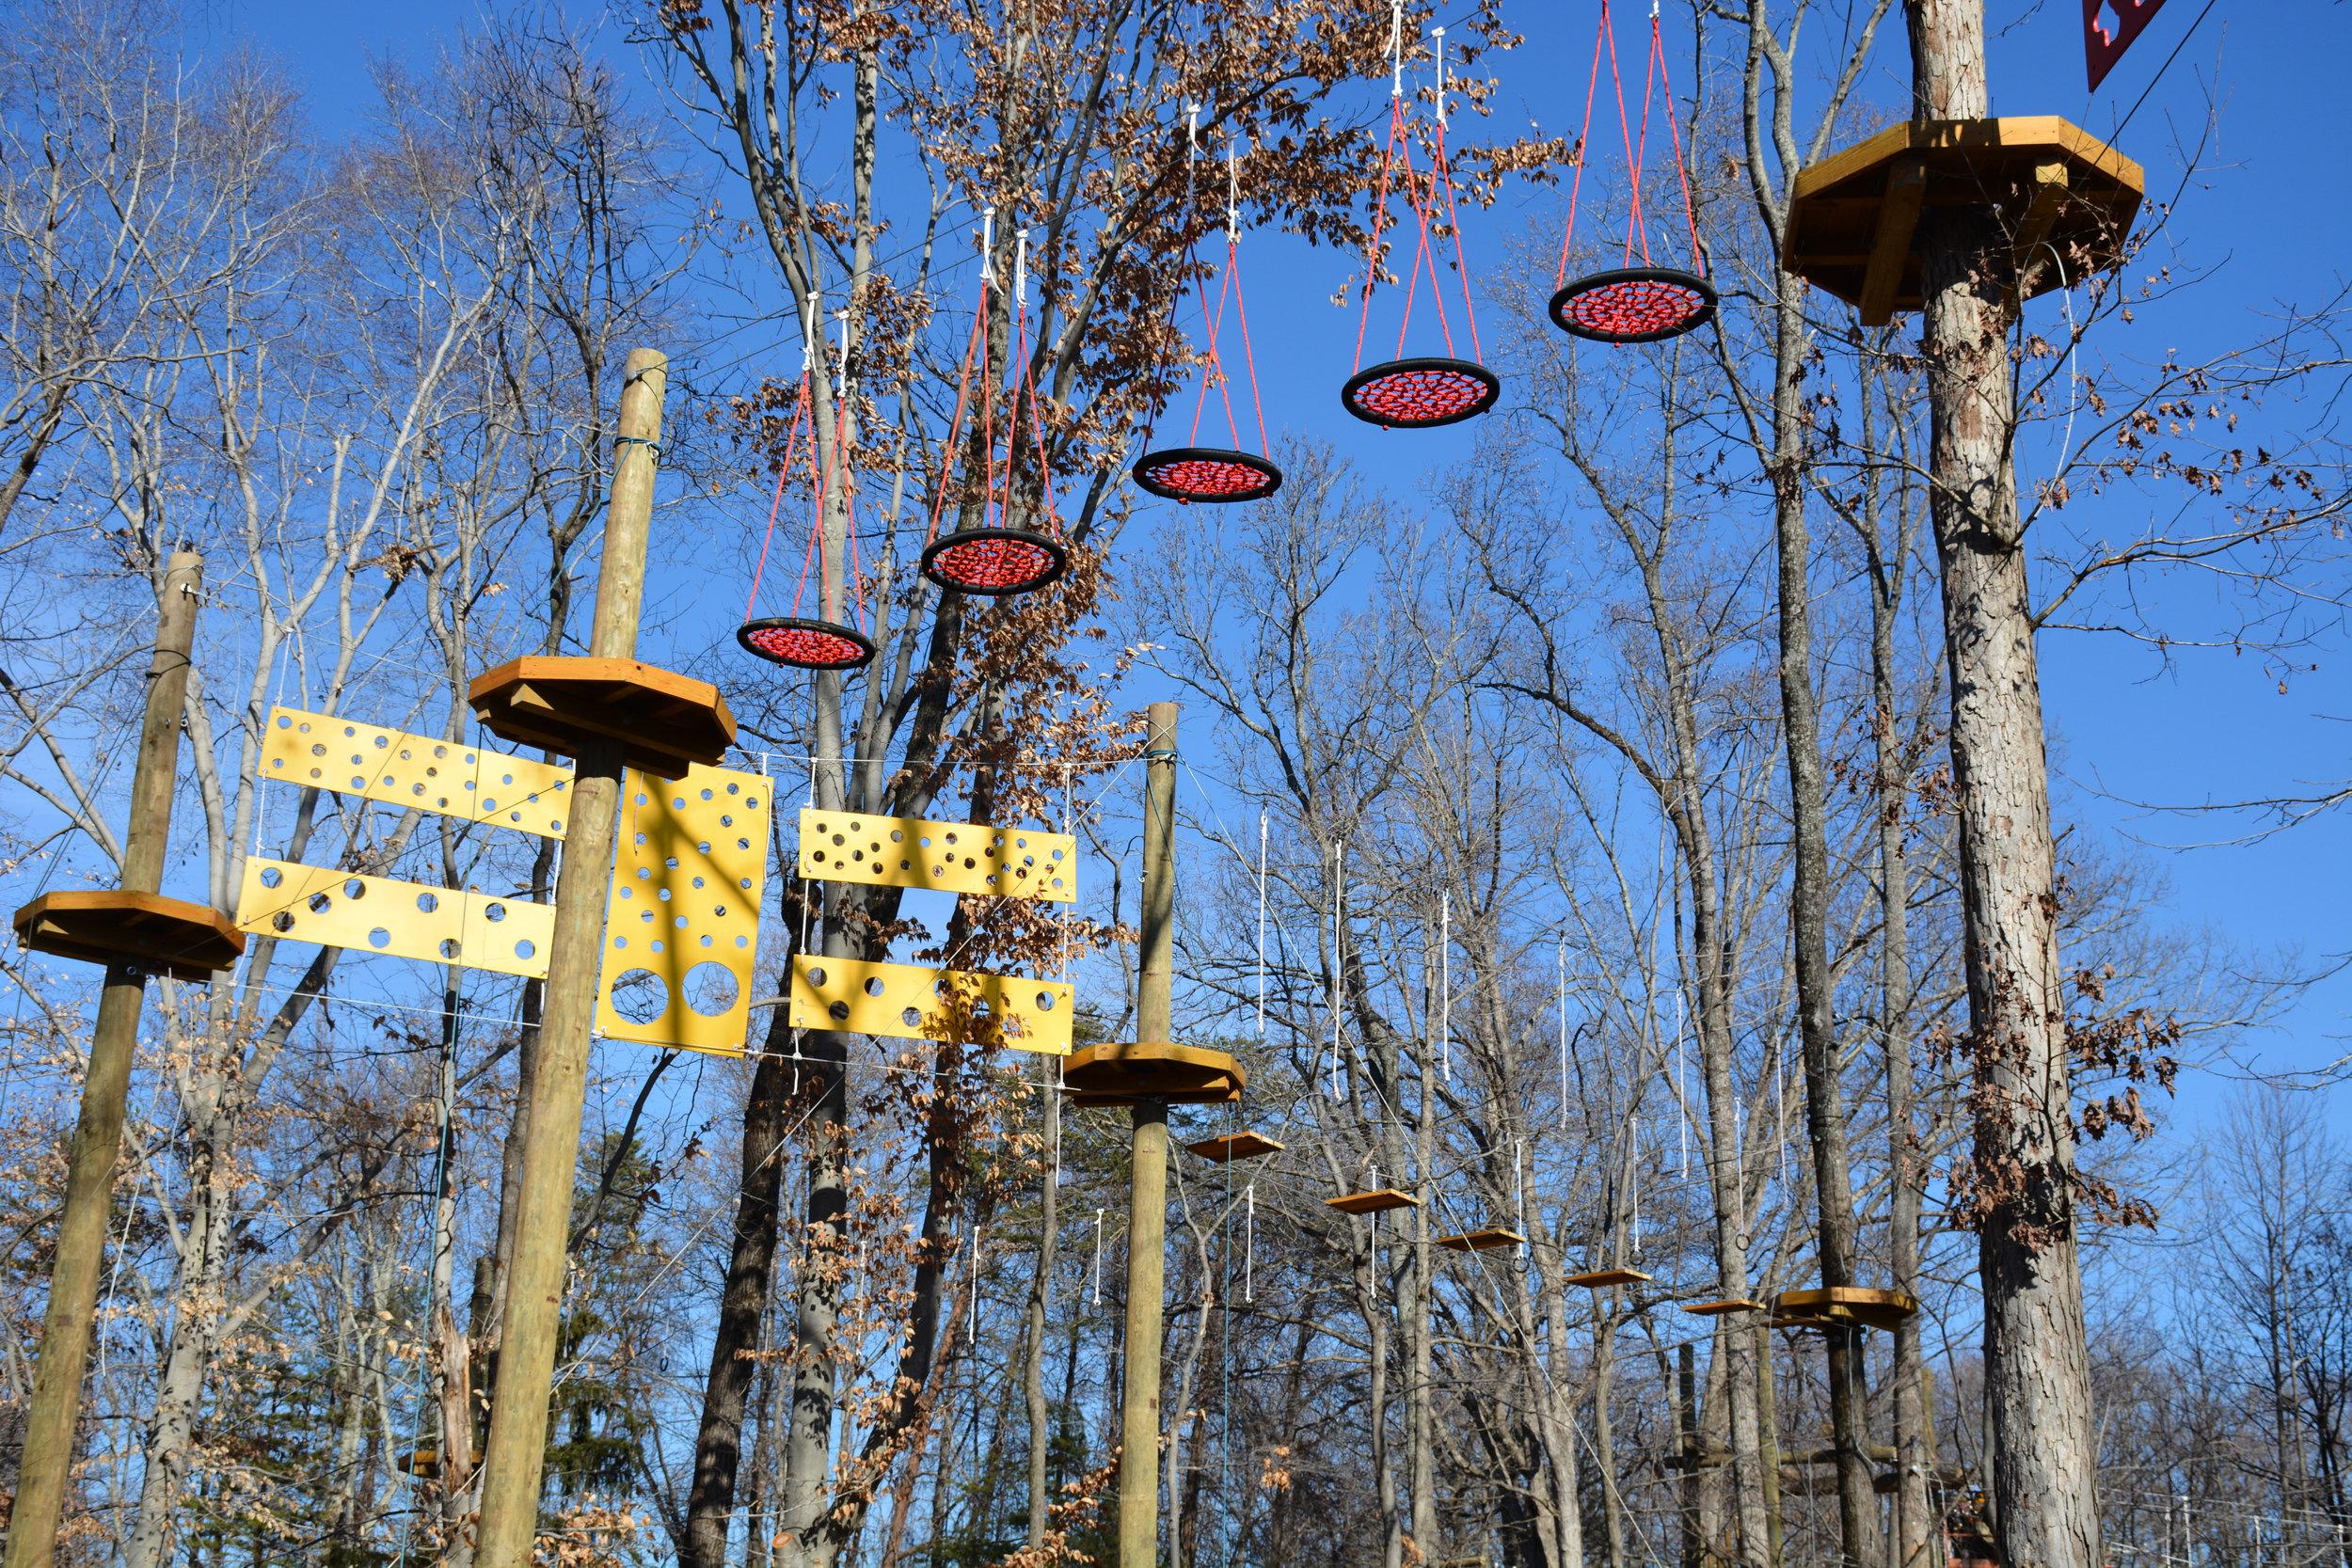 Greensboro Science Center's new Sky Wild treetop adventure course. Image credit: Greensboro Science Center.